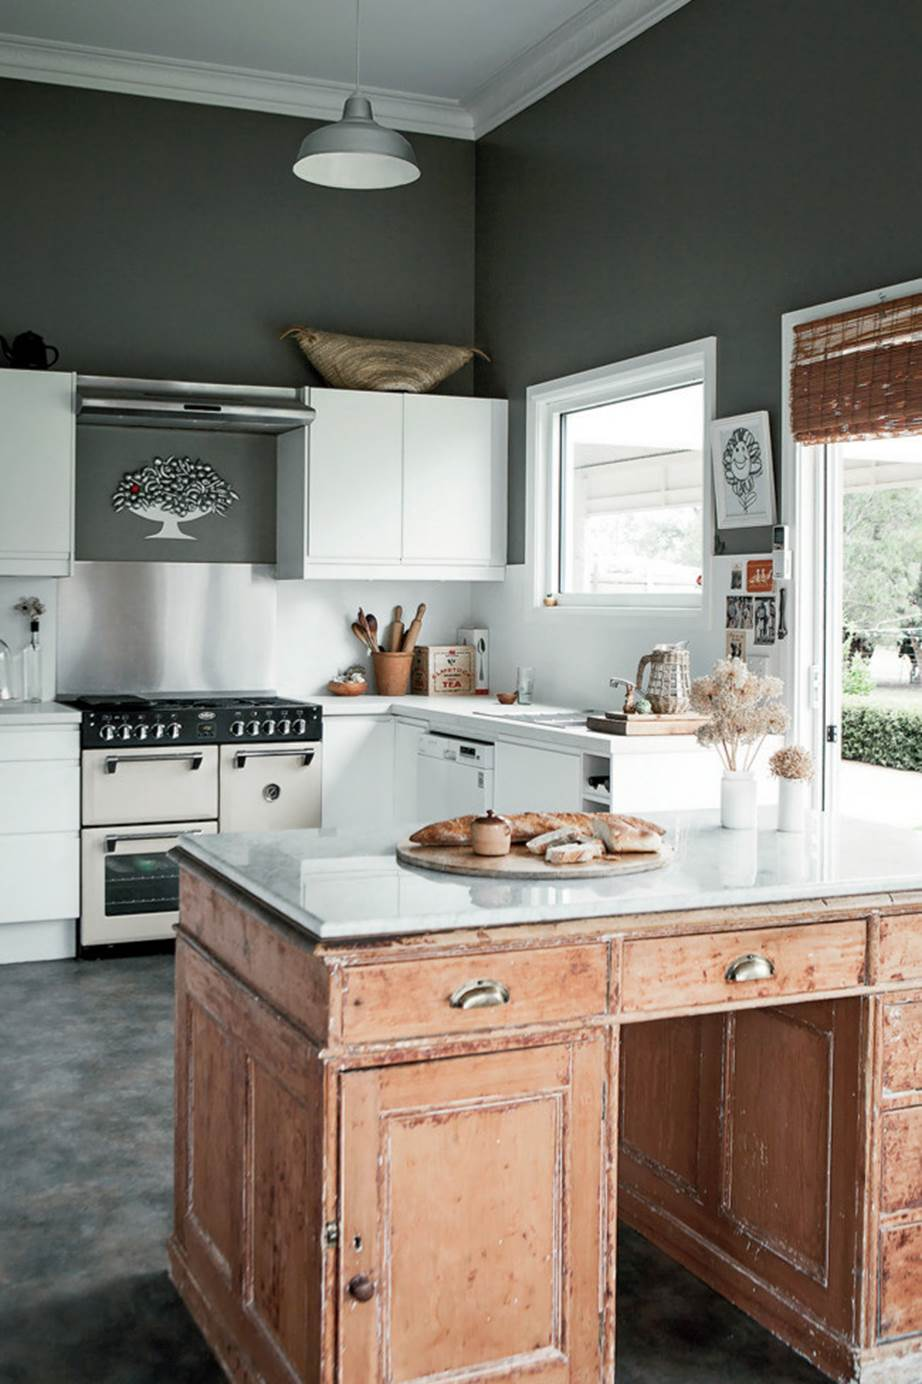 20 Country Kitchen Table Decor Ideas – Luvne.com